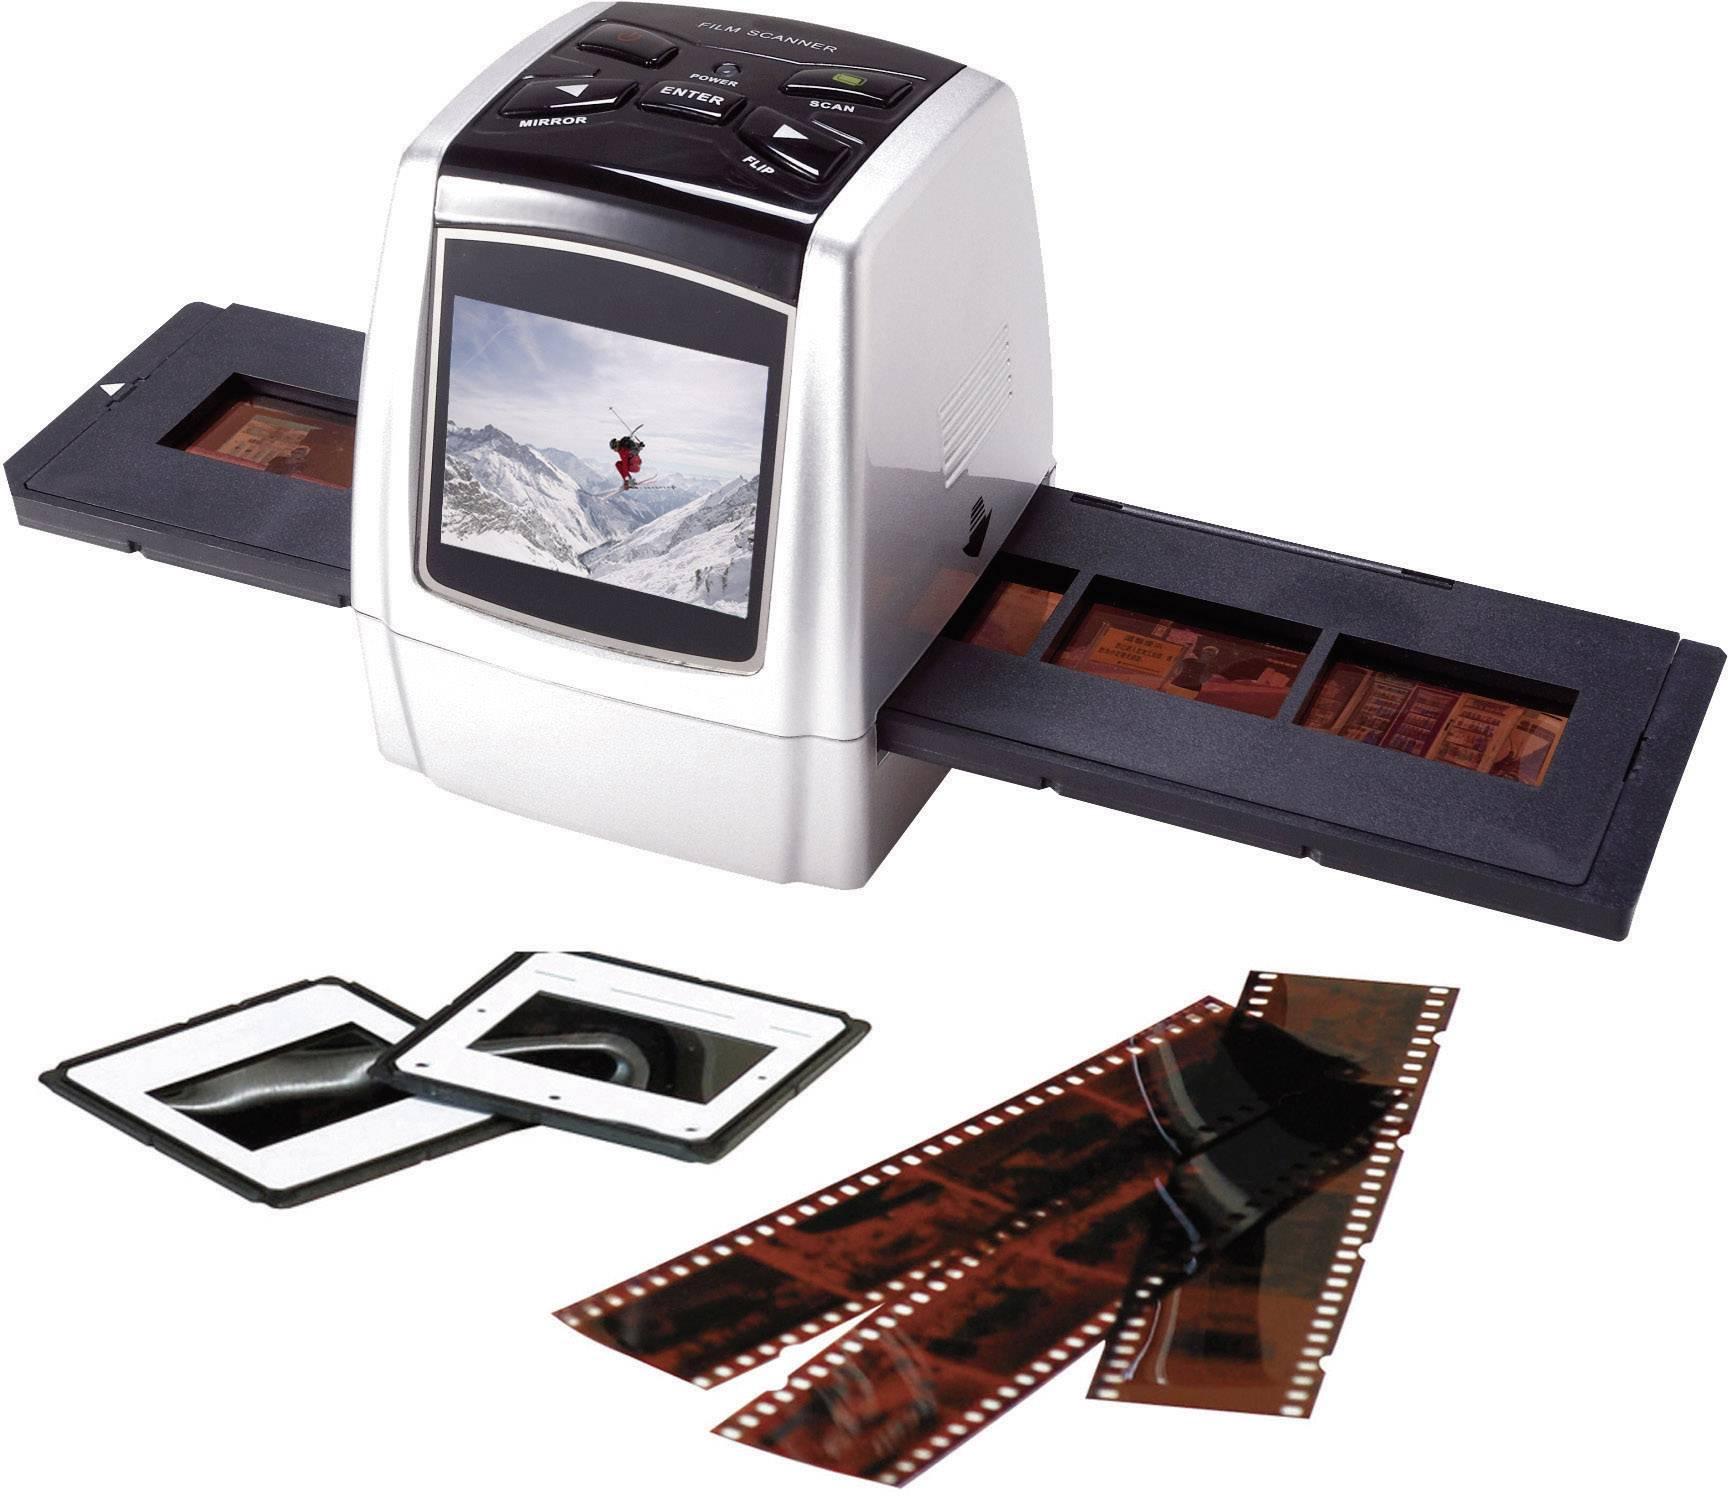 Skener diapozitívov, skener negatívov, imax IM0710, N/A